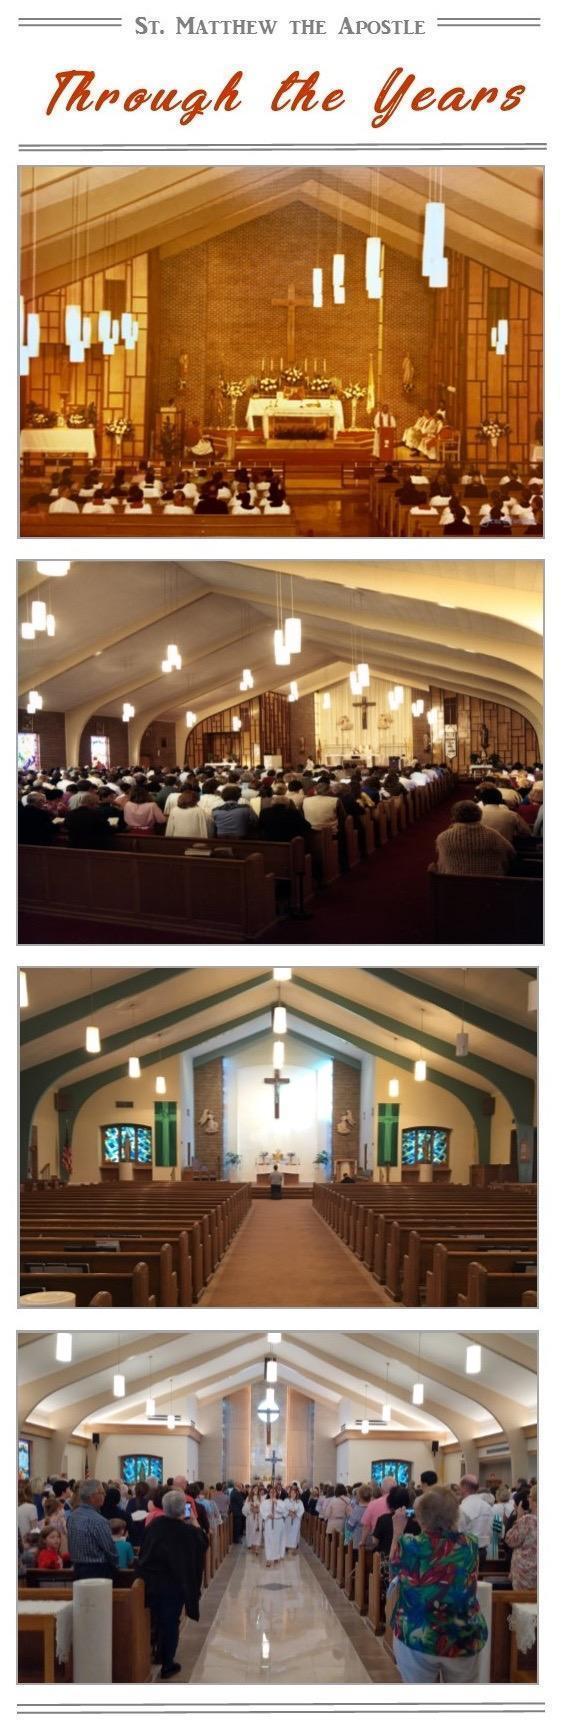 St. Matthew Church through the years.